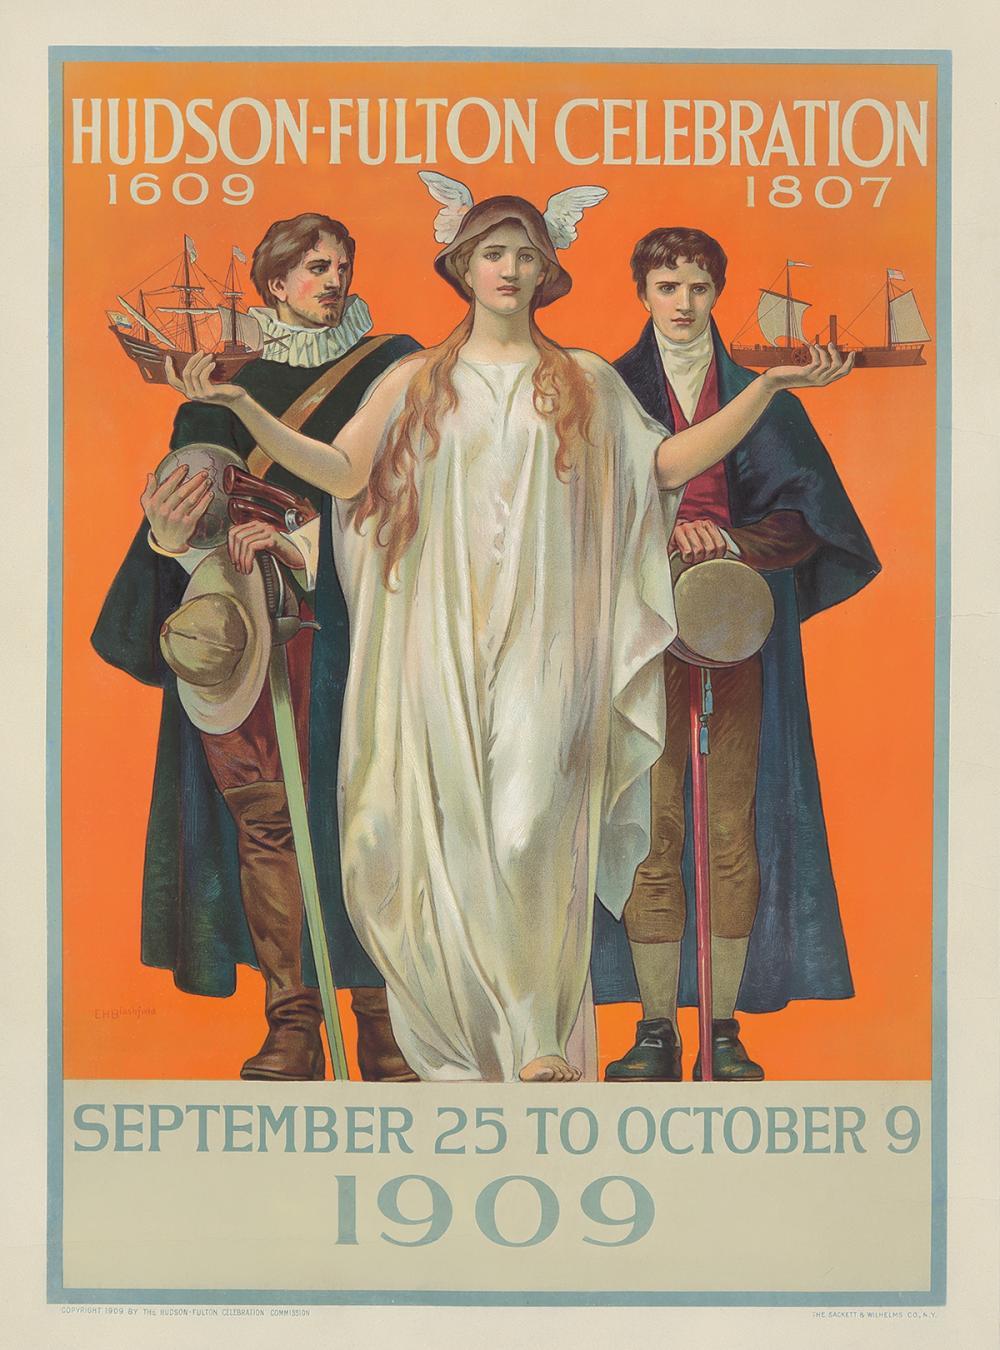 Hudson-Fulton Celebration. 1909.